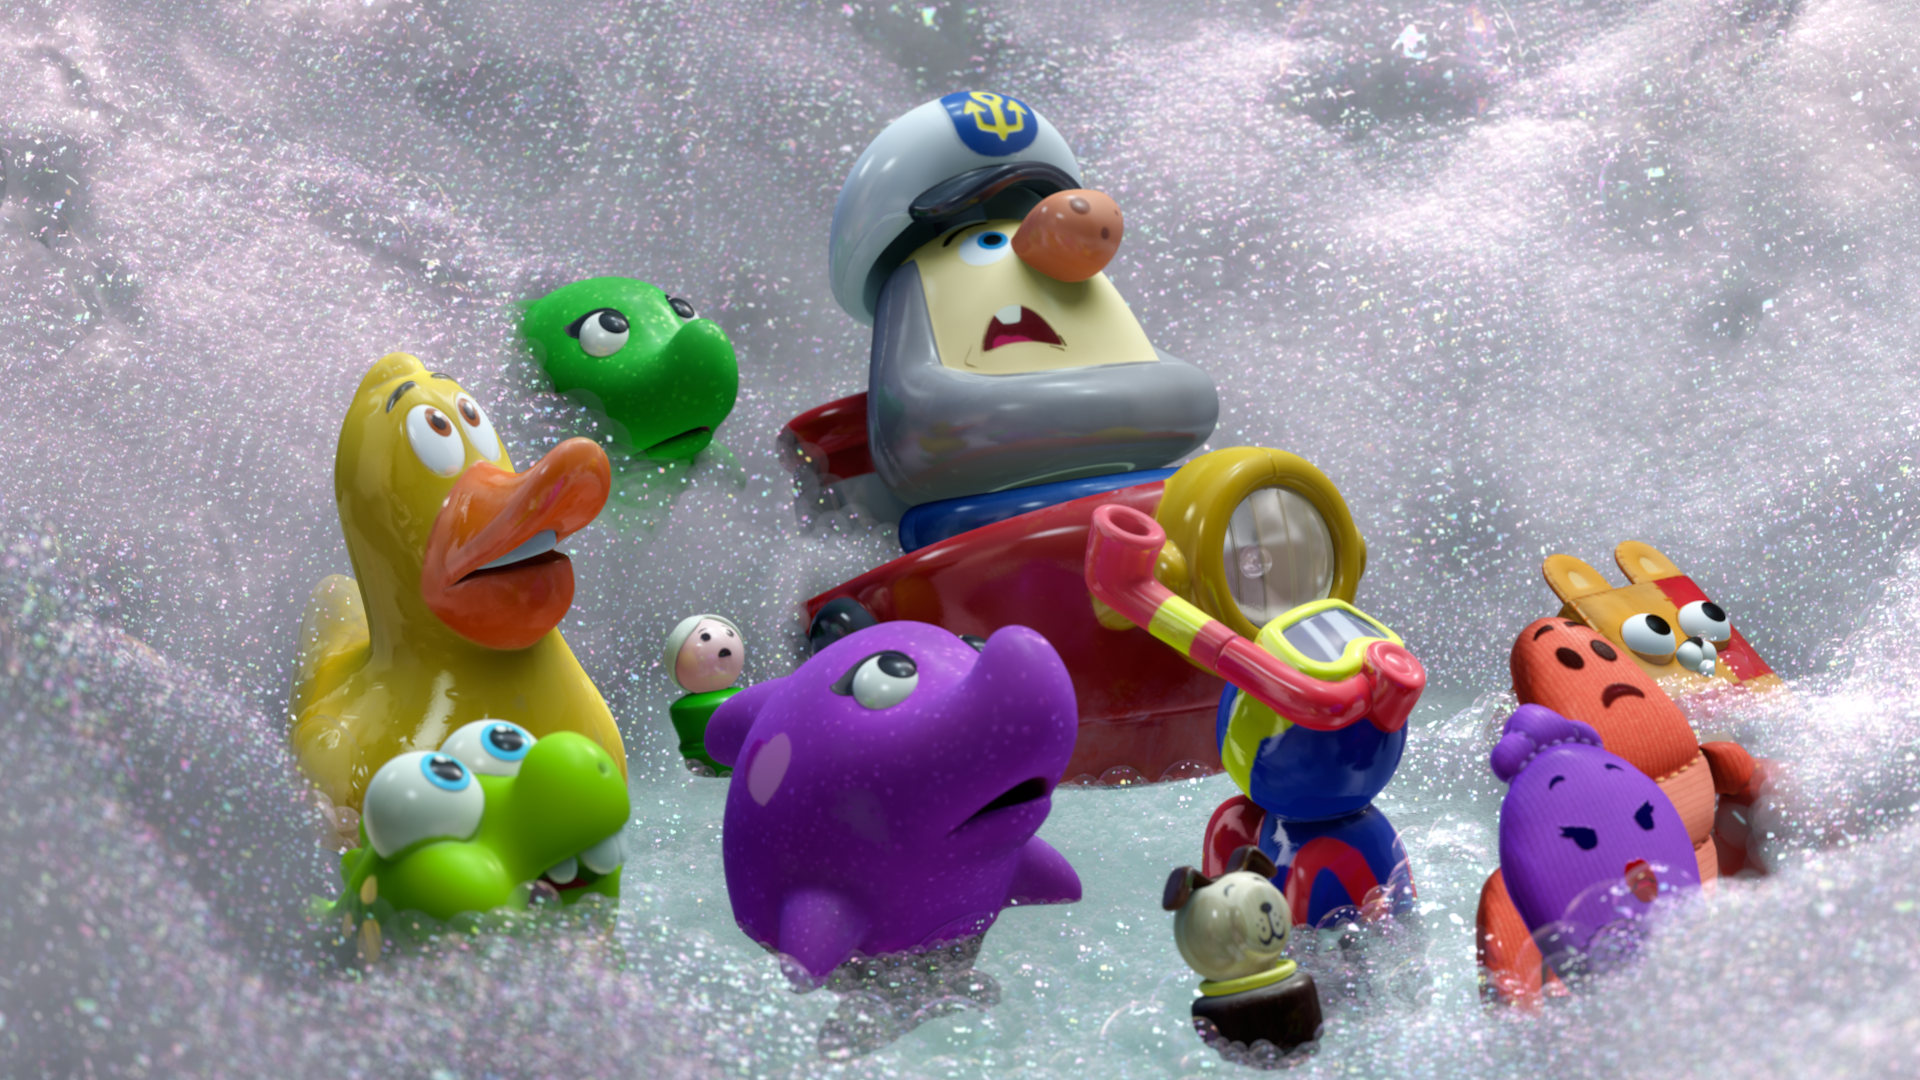 image toy story toons rex roi fête party central disney pixar